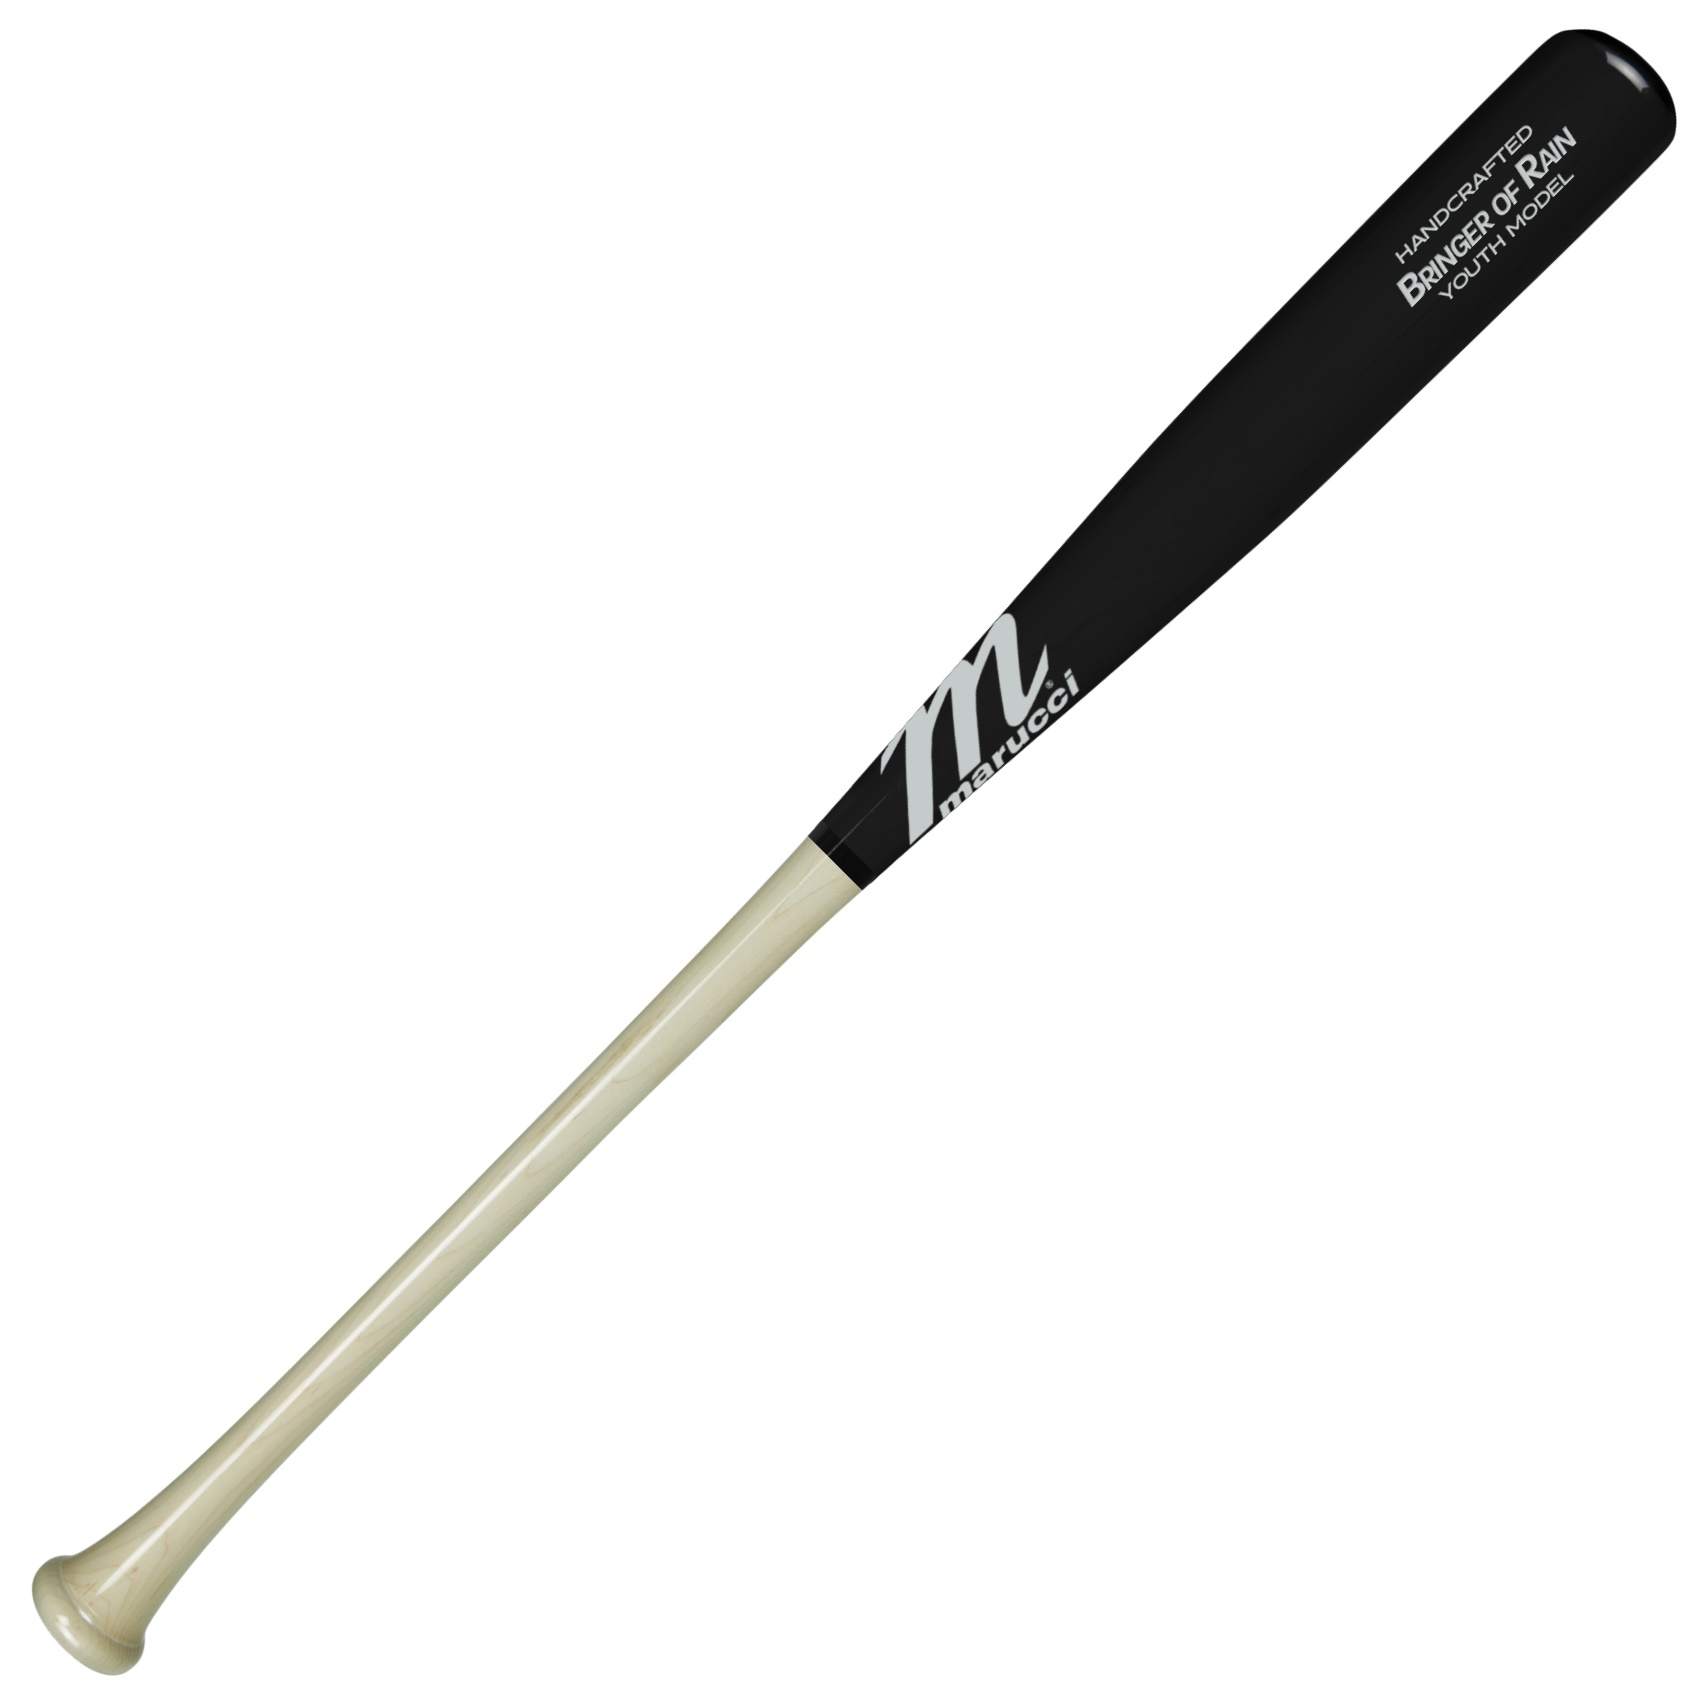 marucci-bringer-of-rain-youth-maple-wood-baseball-bat-31-inch MYVE2BOR-NBK-31 Marucci 840058700831 <h1 class=productView-title-lower>YOUTH JOSH DONALDSON BRINGER OF RAIN PRO MODEL</h1> <span>The Bringer